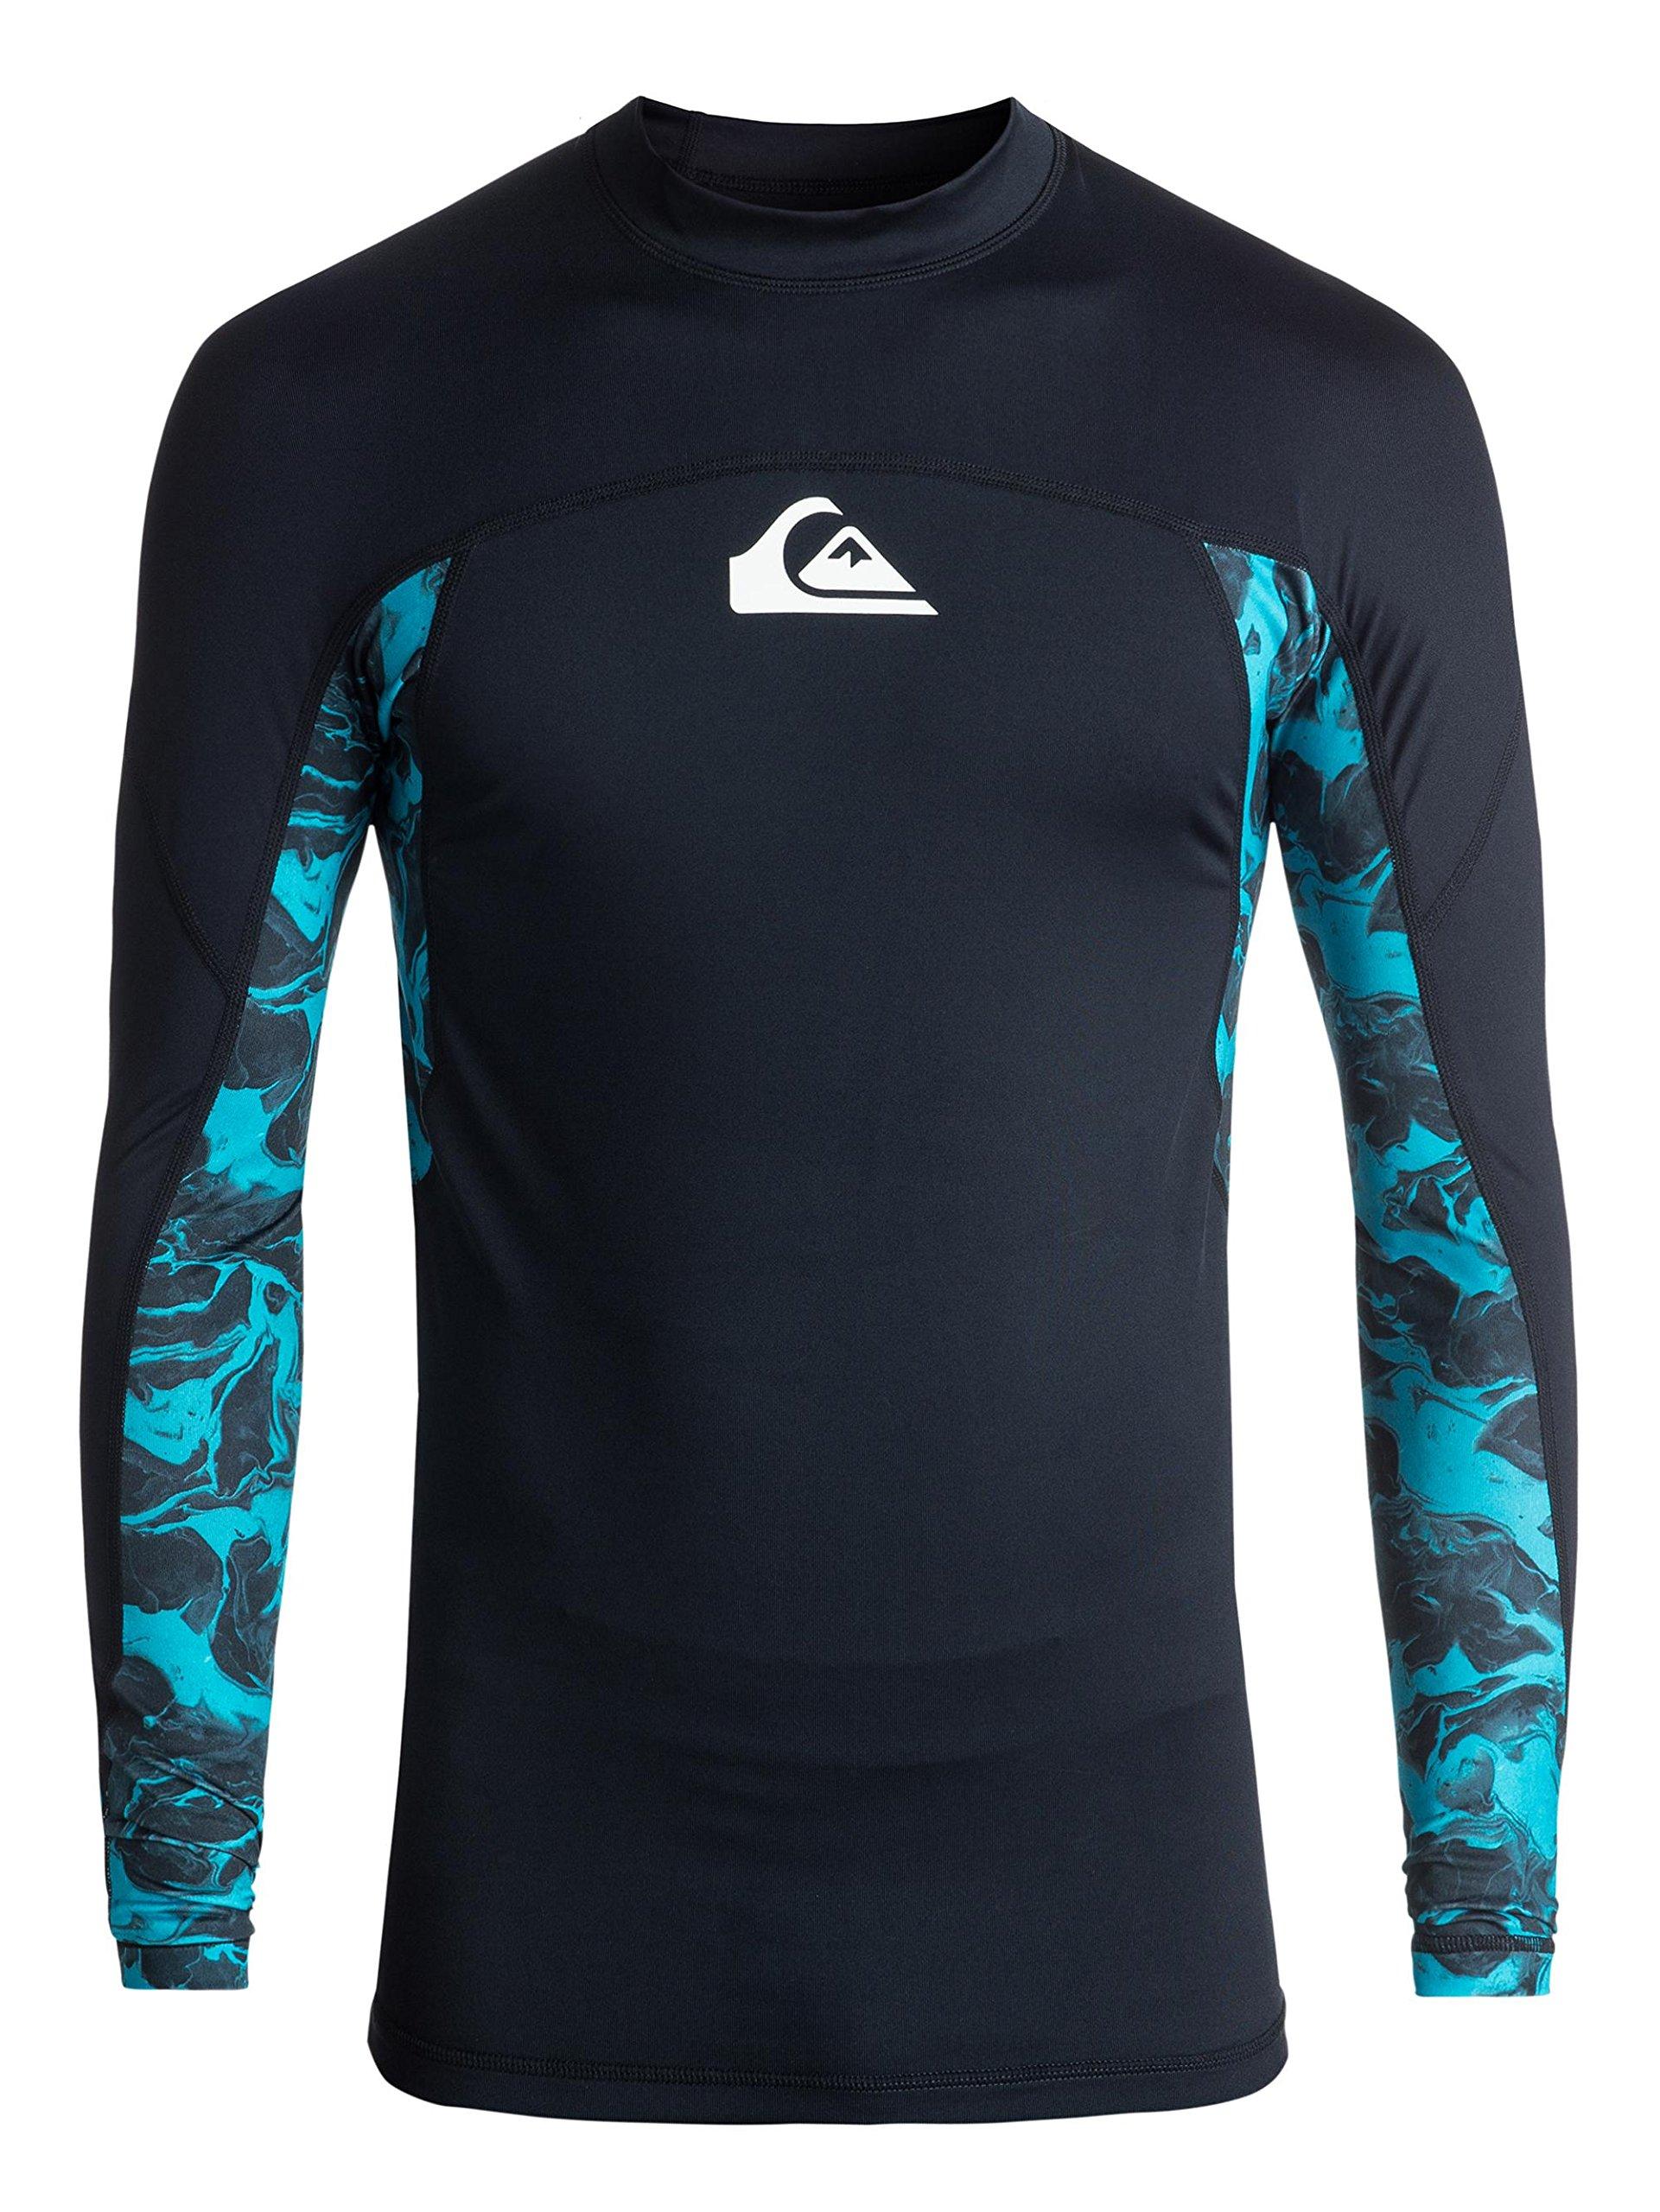 Quiksilver Men's Slash Long Sleeve, Navy Blazer, S